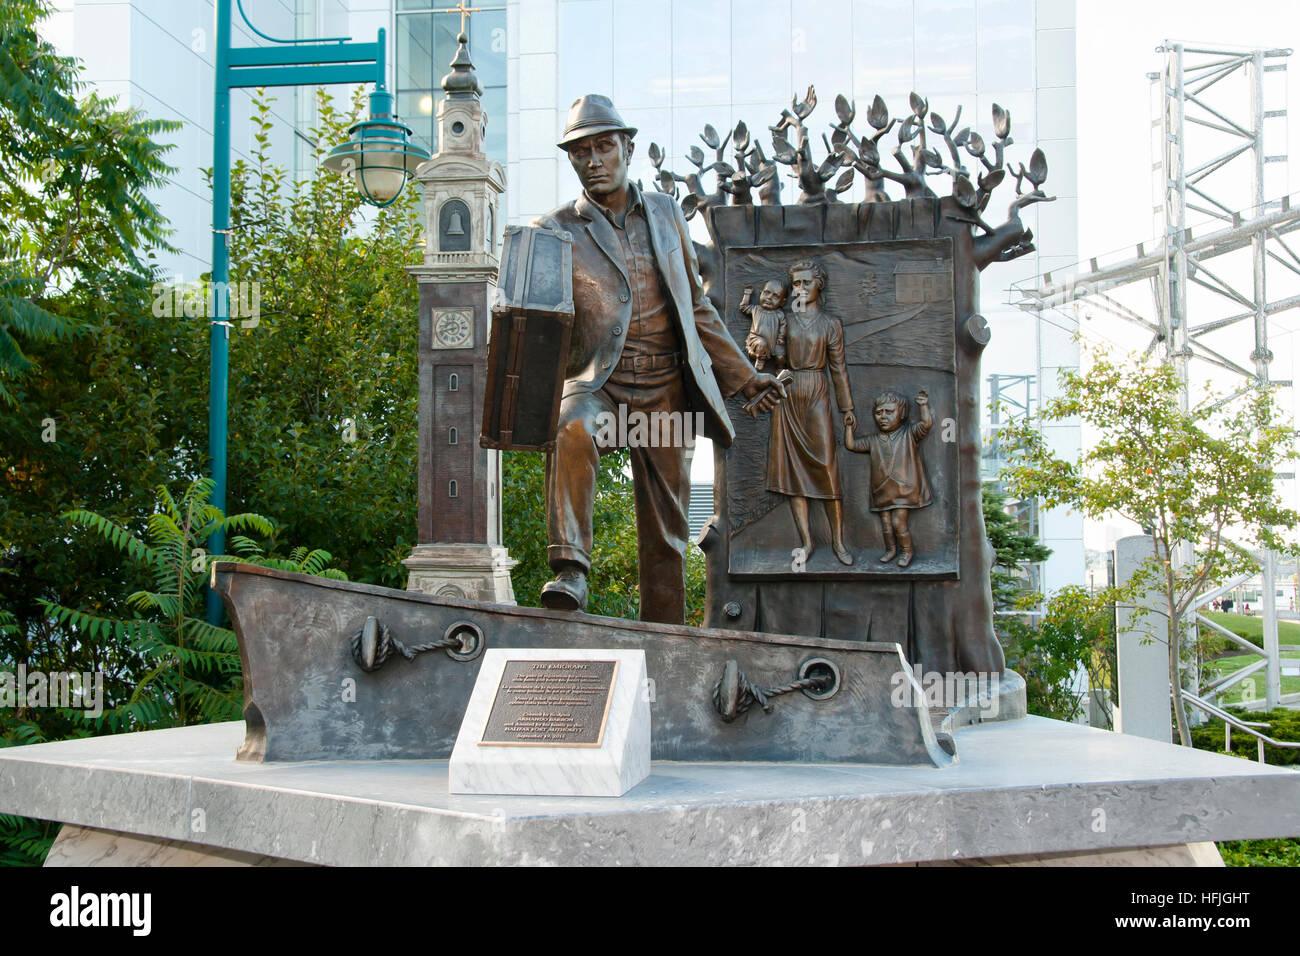 The Emigrant Public Statue - Halifax - Nova Scotia - Stock Image